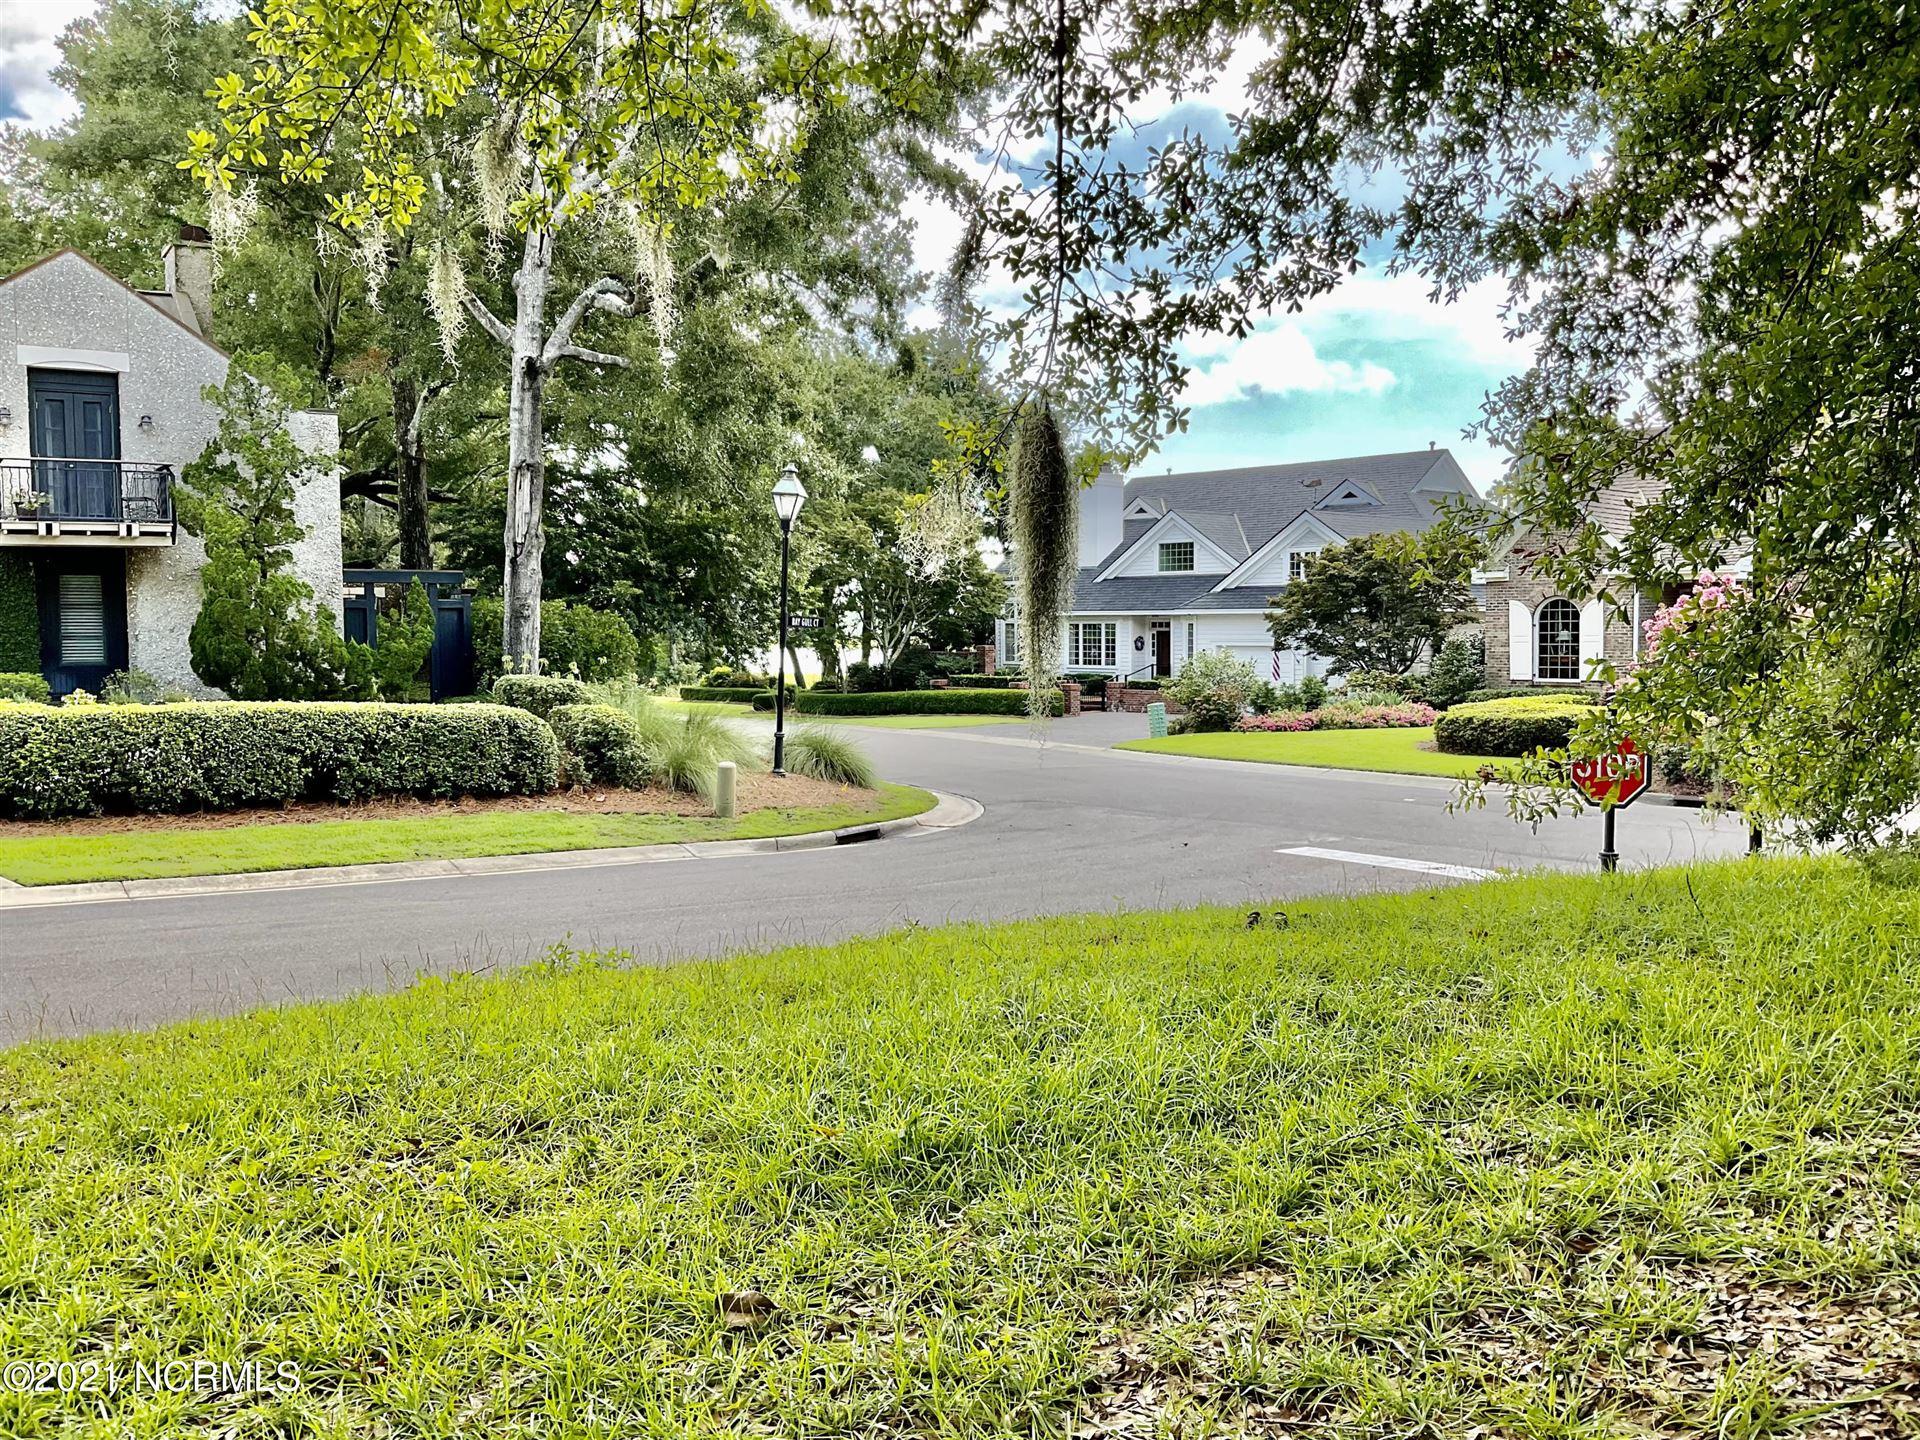 Photo of 1520 Landfall Drive Drive, Wilmington, NC 28405 (MLS # 100287329)